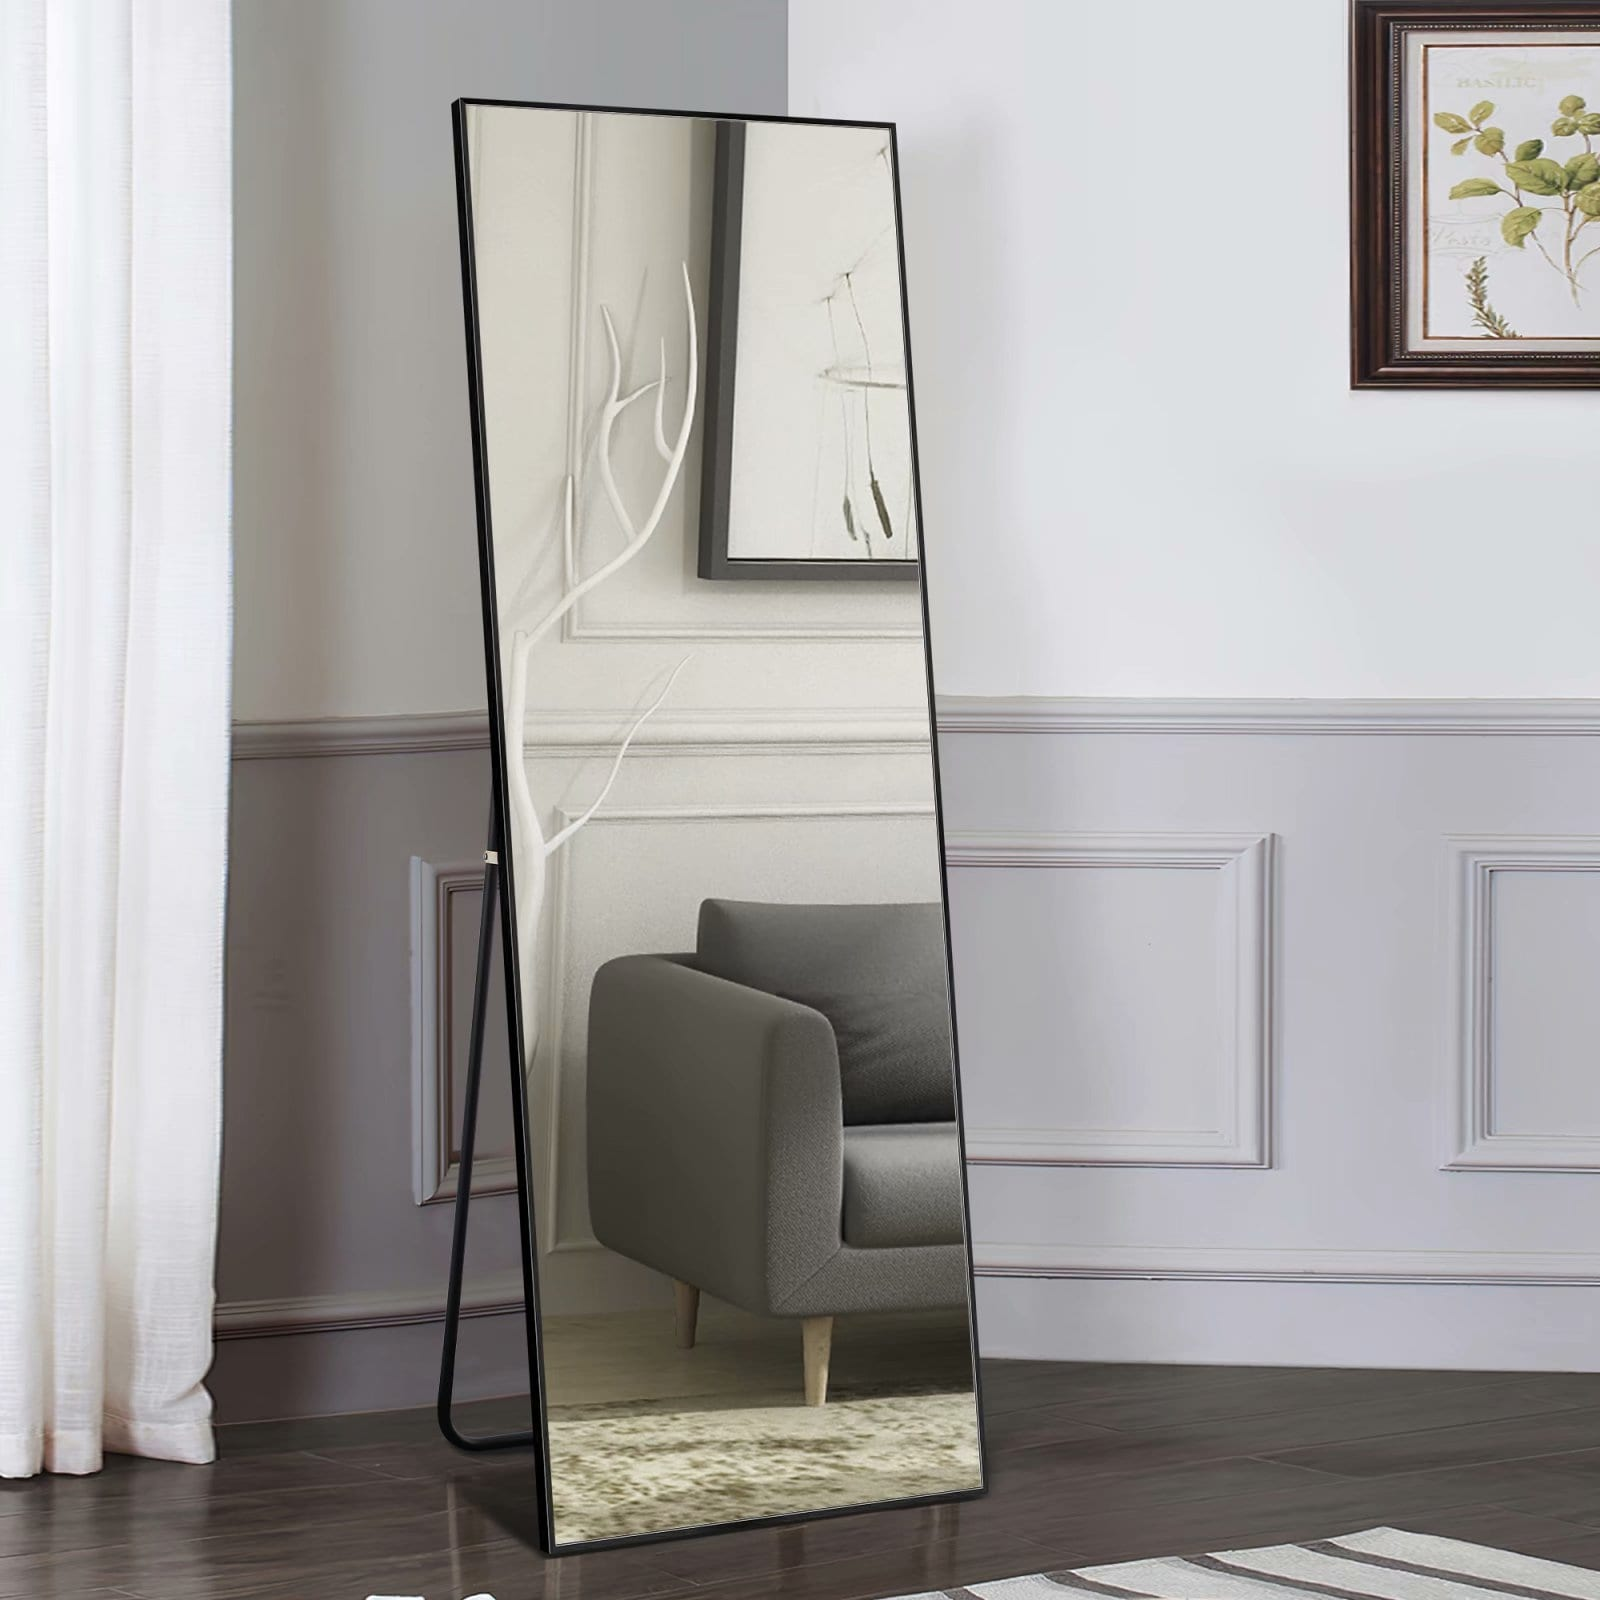 Shop Aluminum Alloy Full Length Mirror Floor Mirror With Standing 64x21 Overstock 31842220